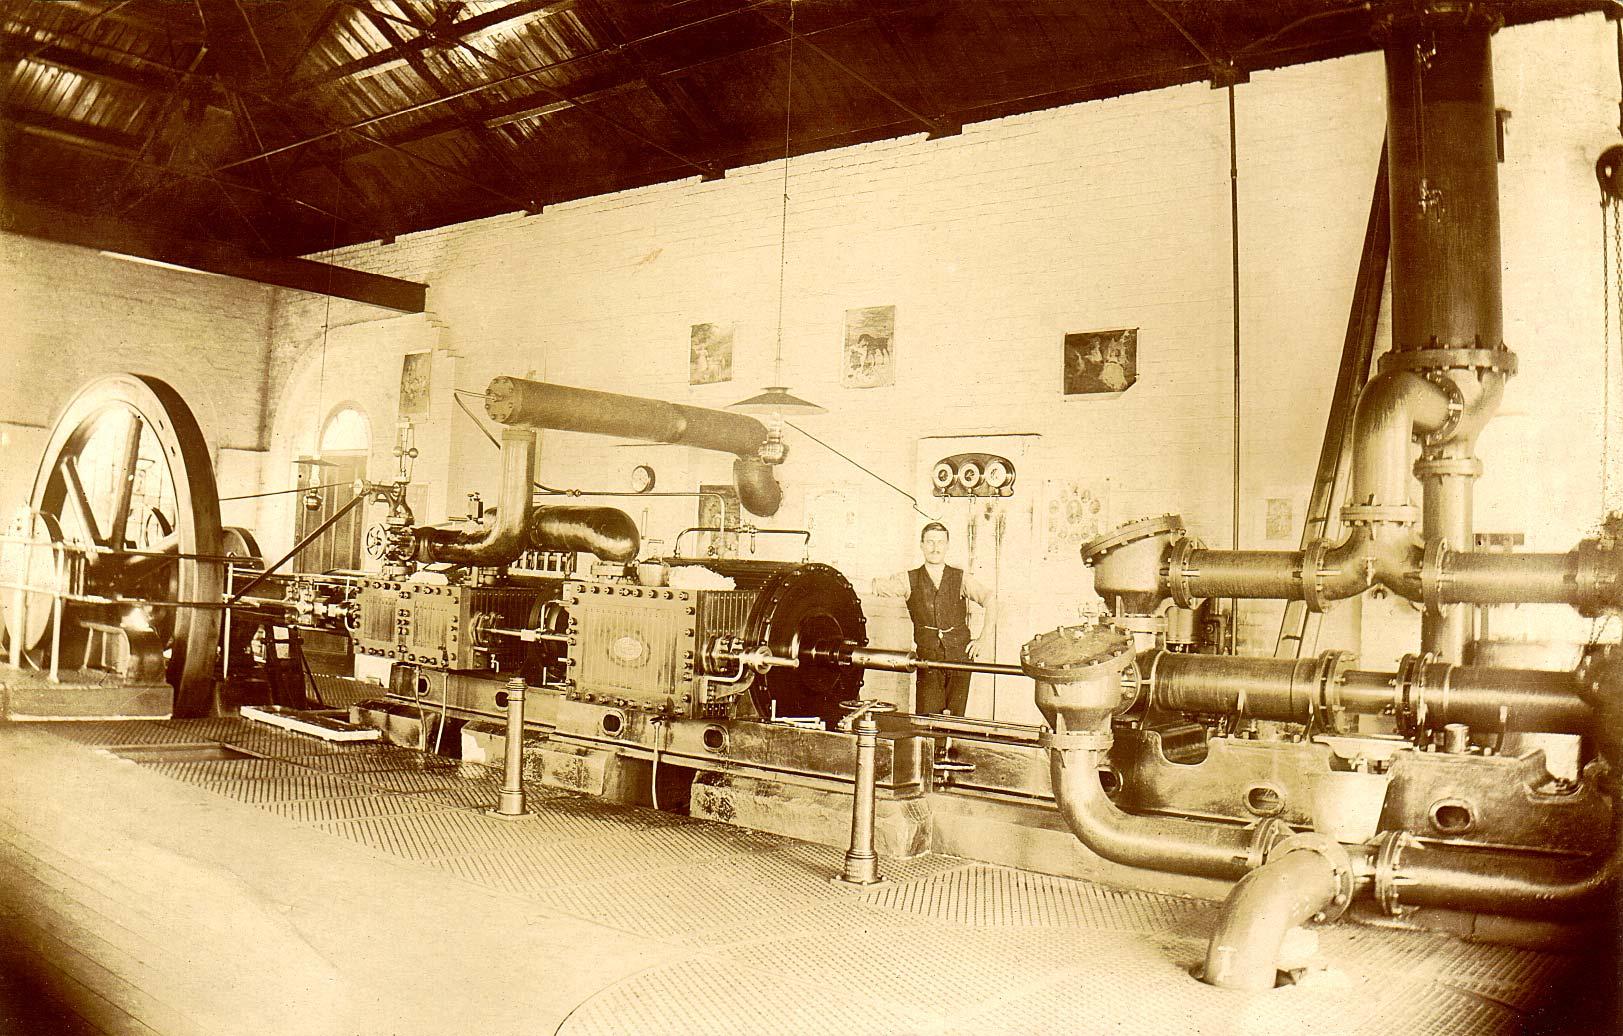 Goudhurst old waterworks